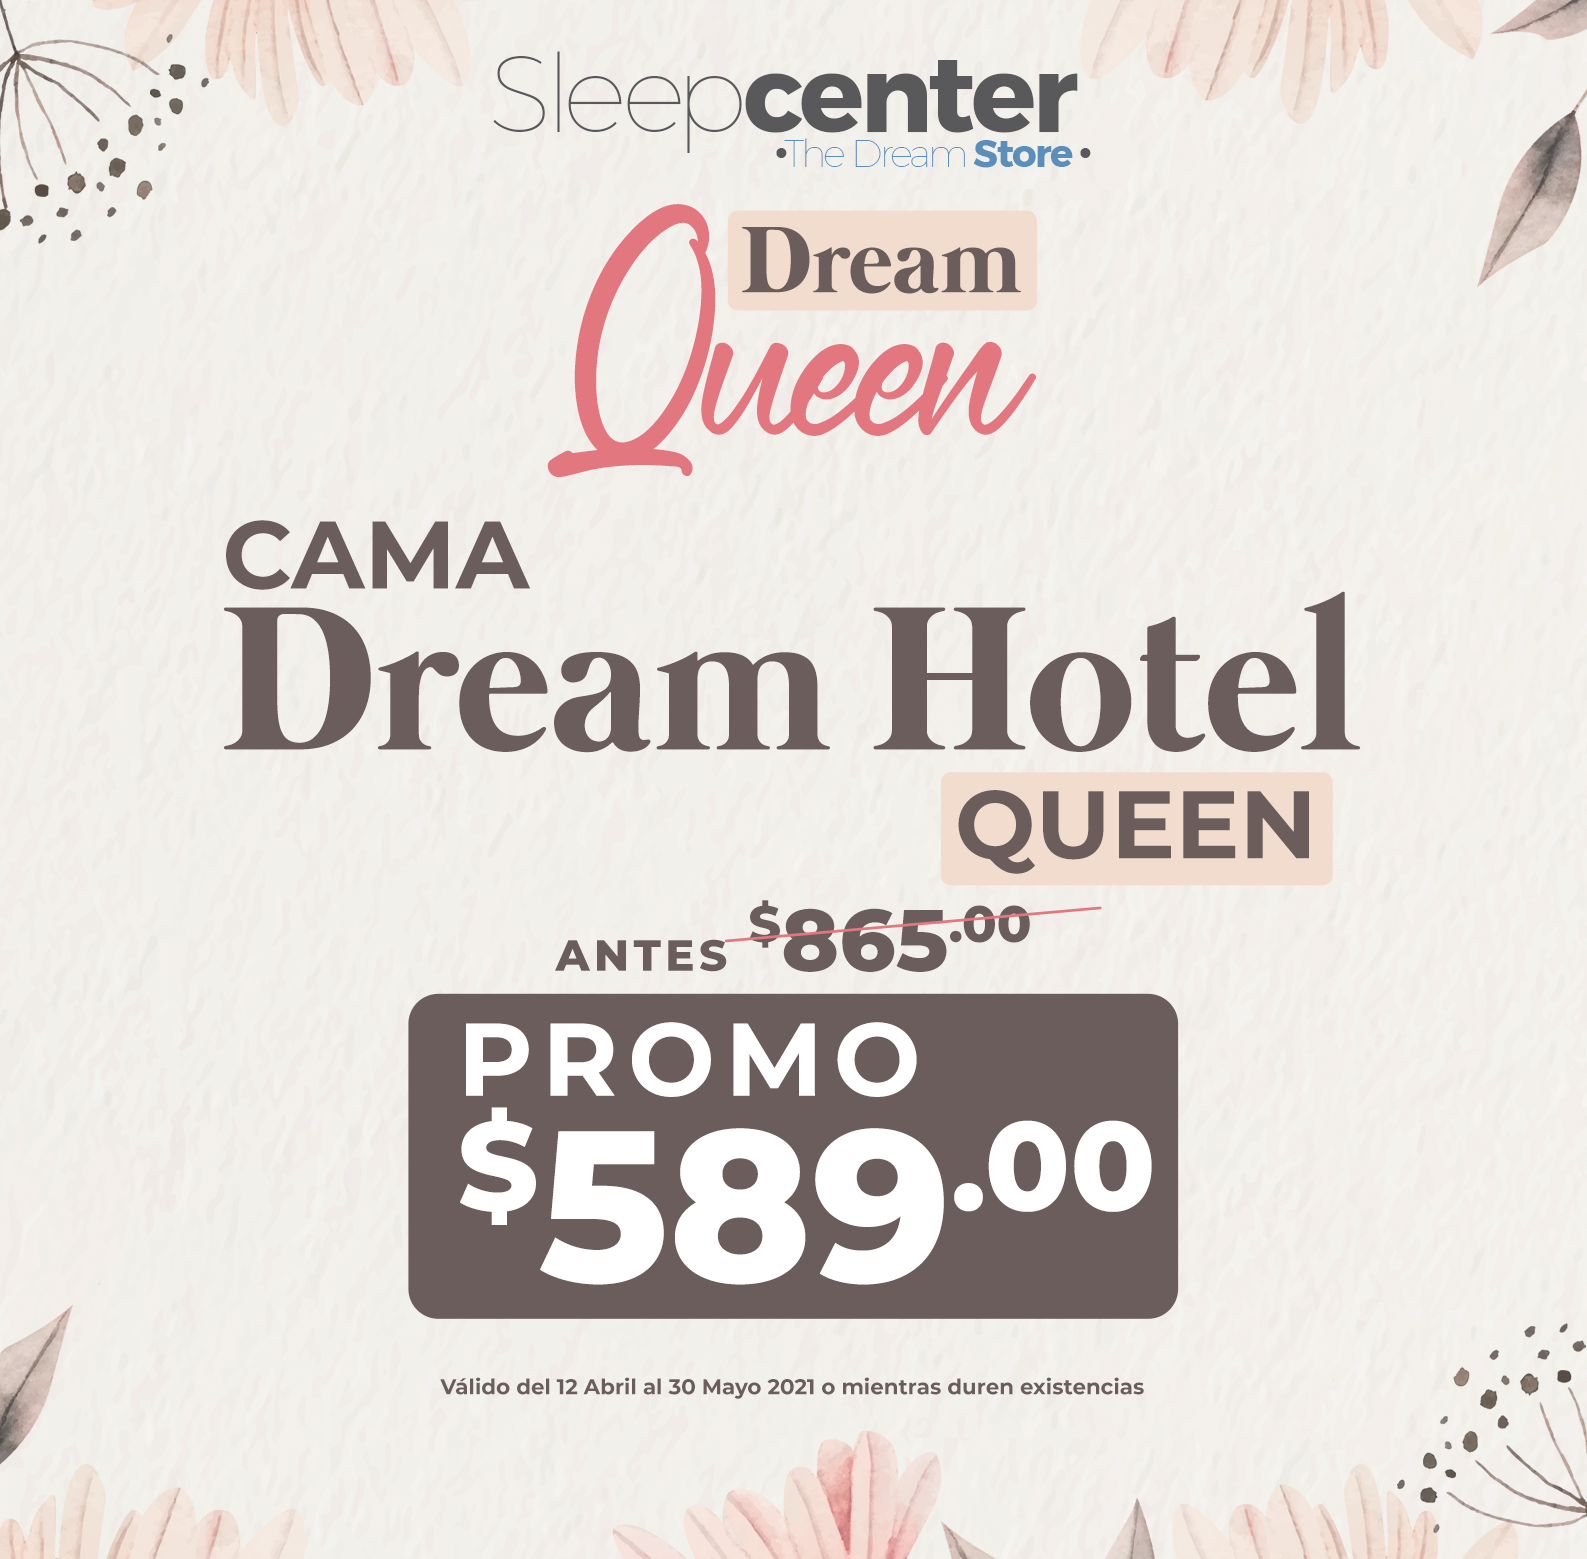 TENCARD-DREAM-HOTEL-SLEEP-CENTER